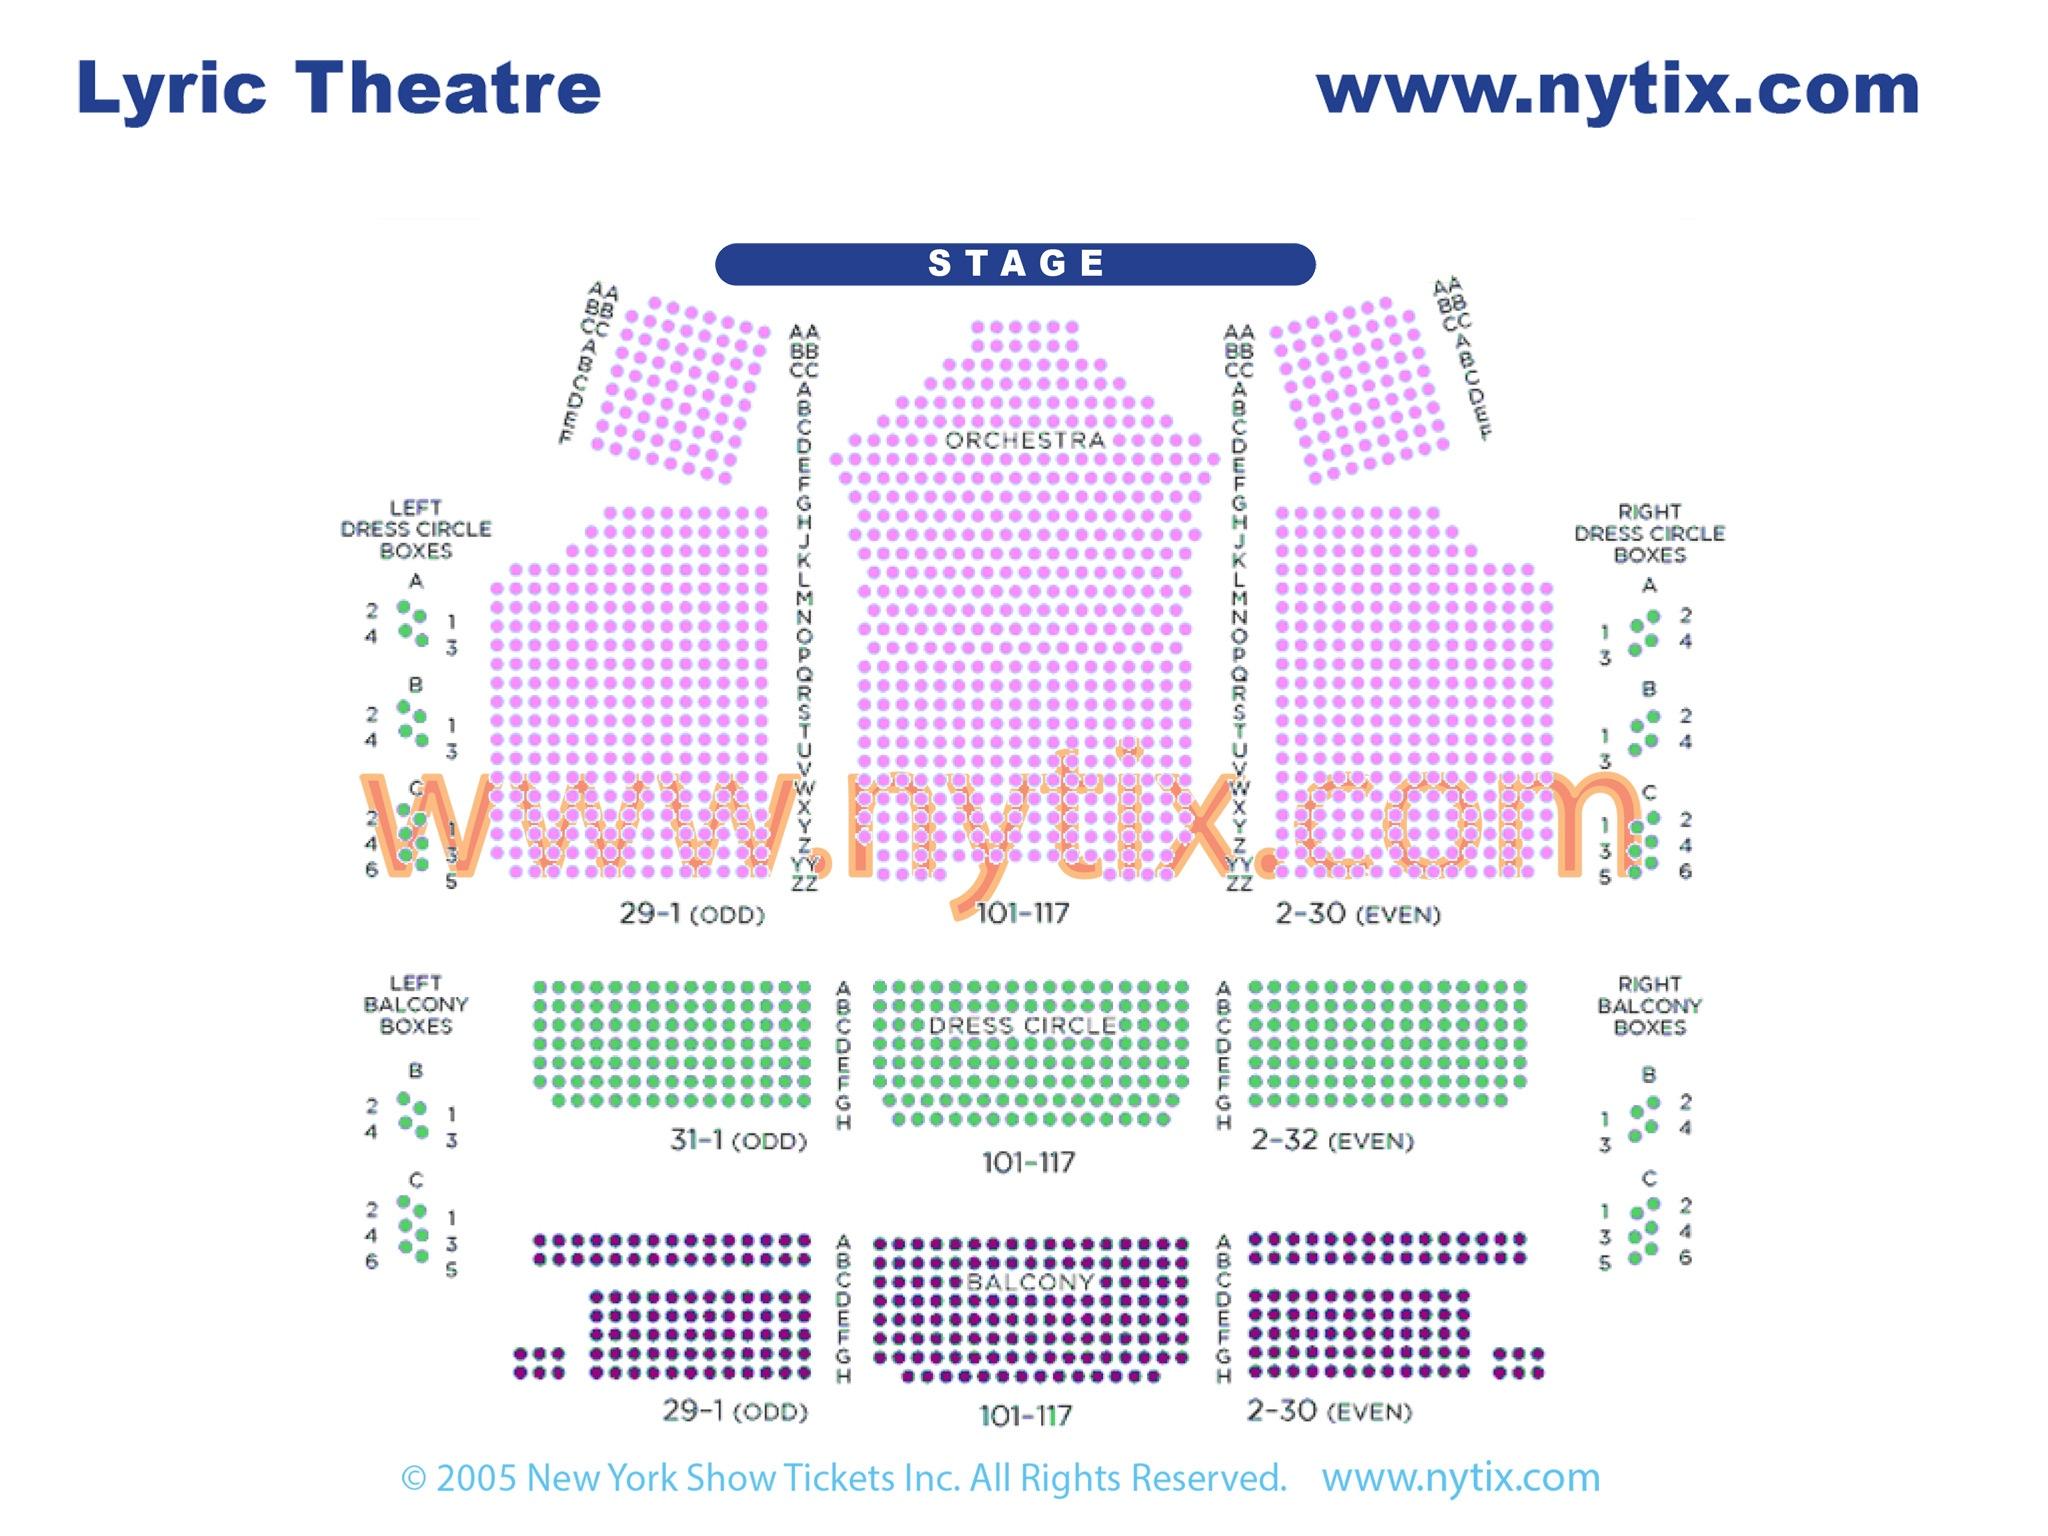 Lyric Theatre Seating Chart